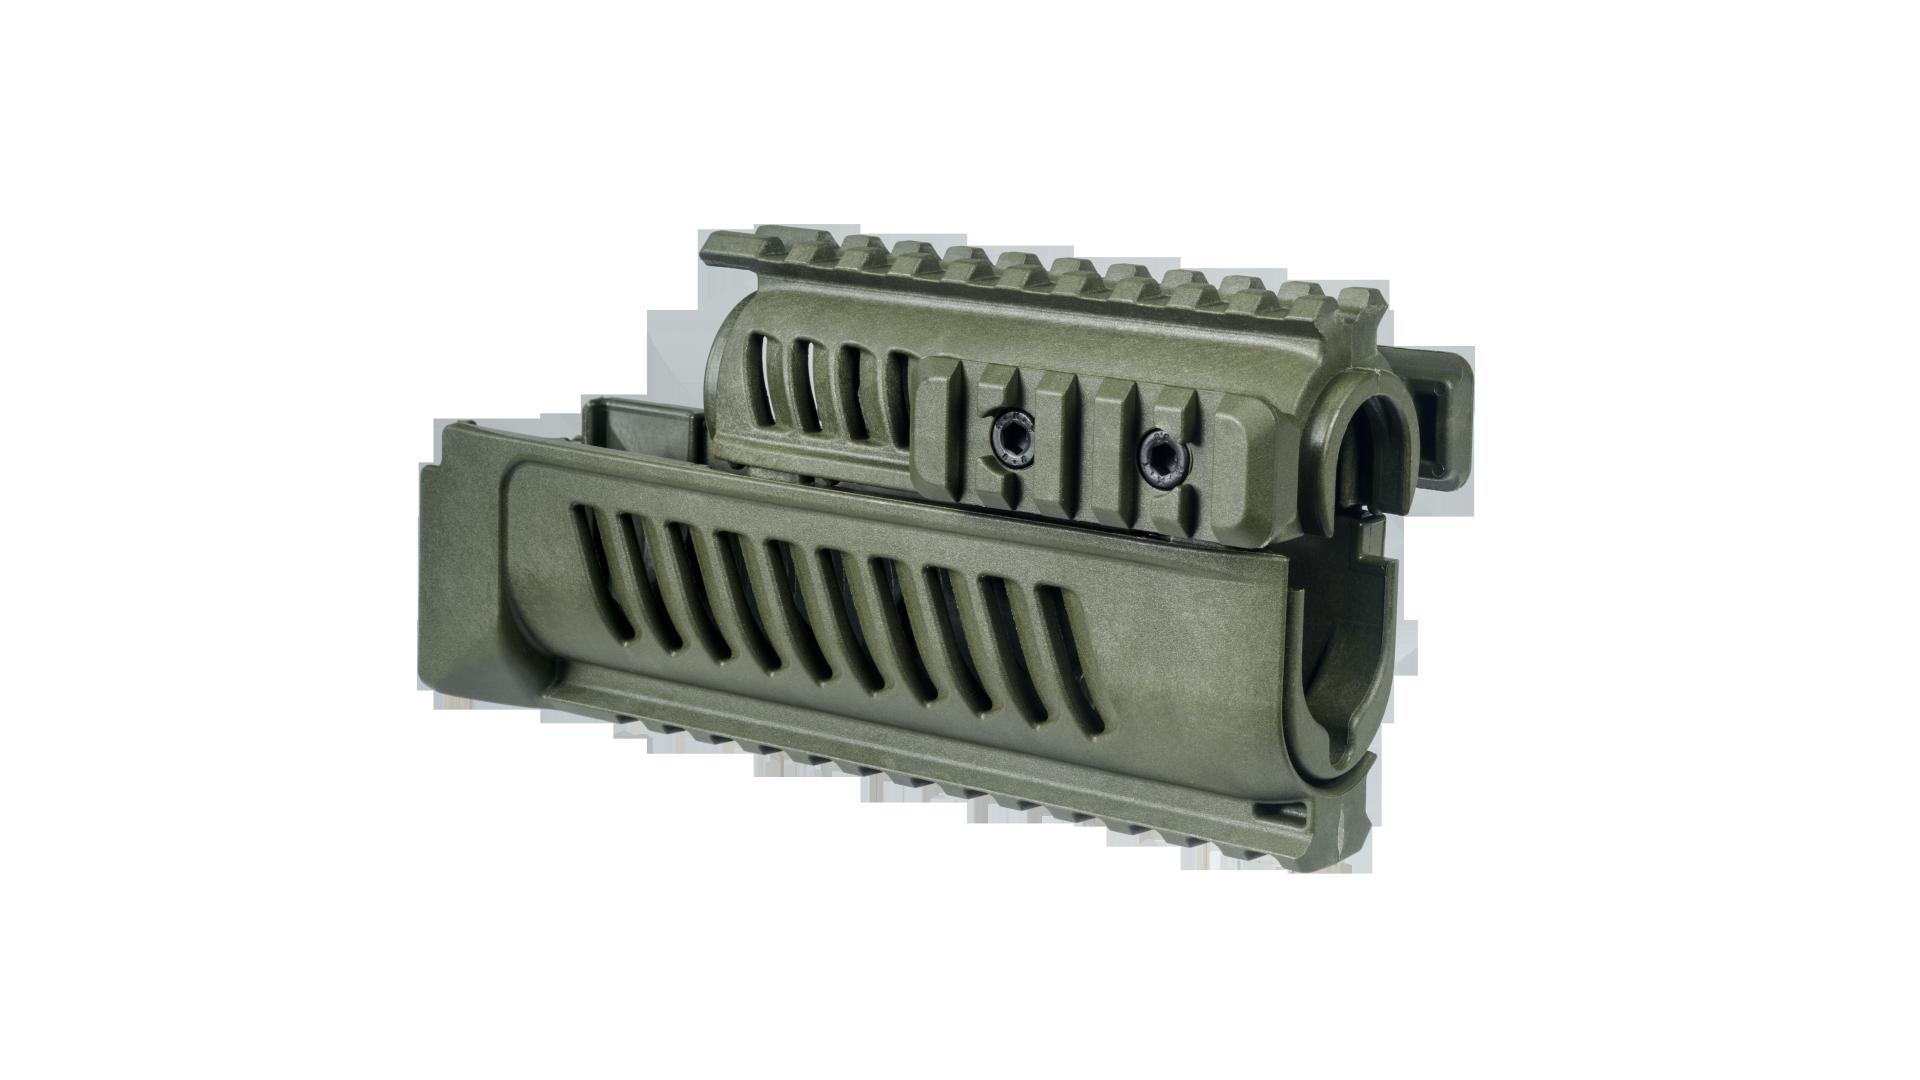 AK -47 Polymer Quad-rail Handguards